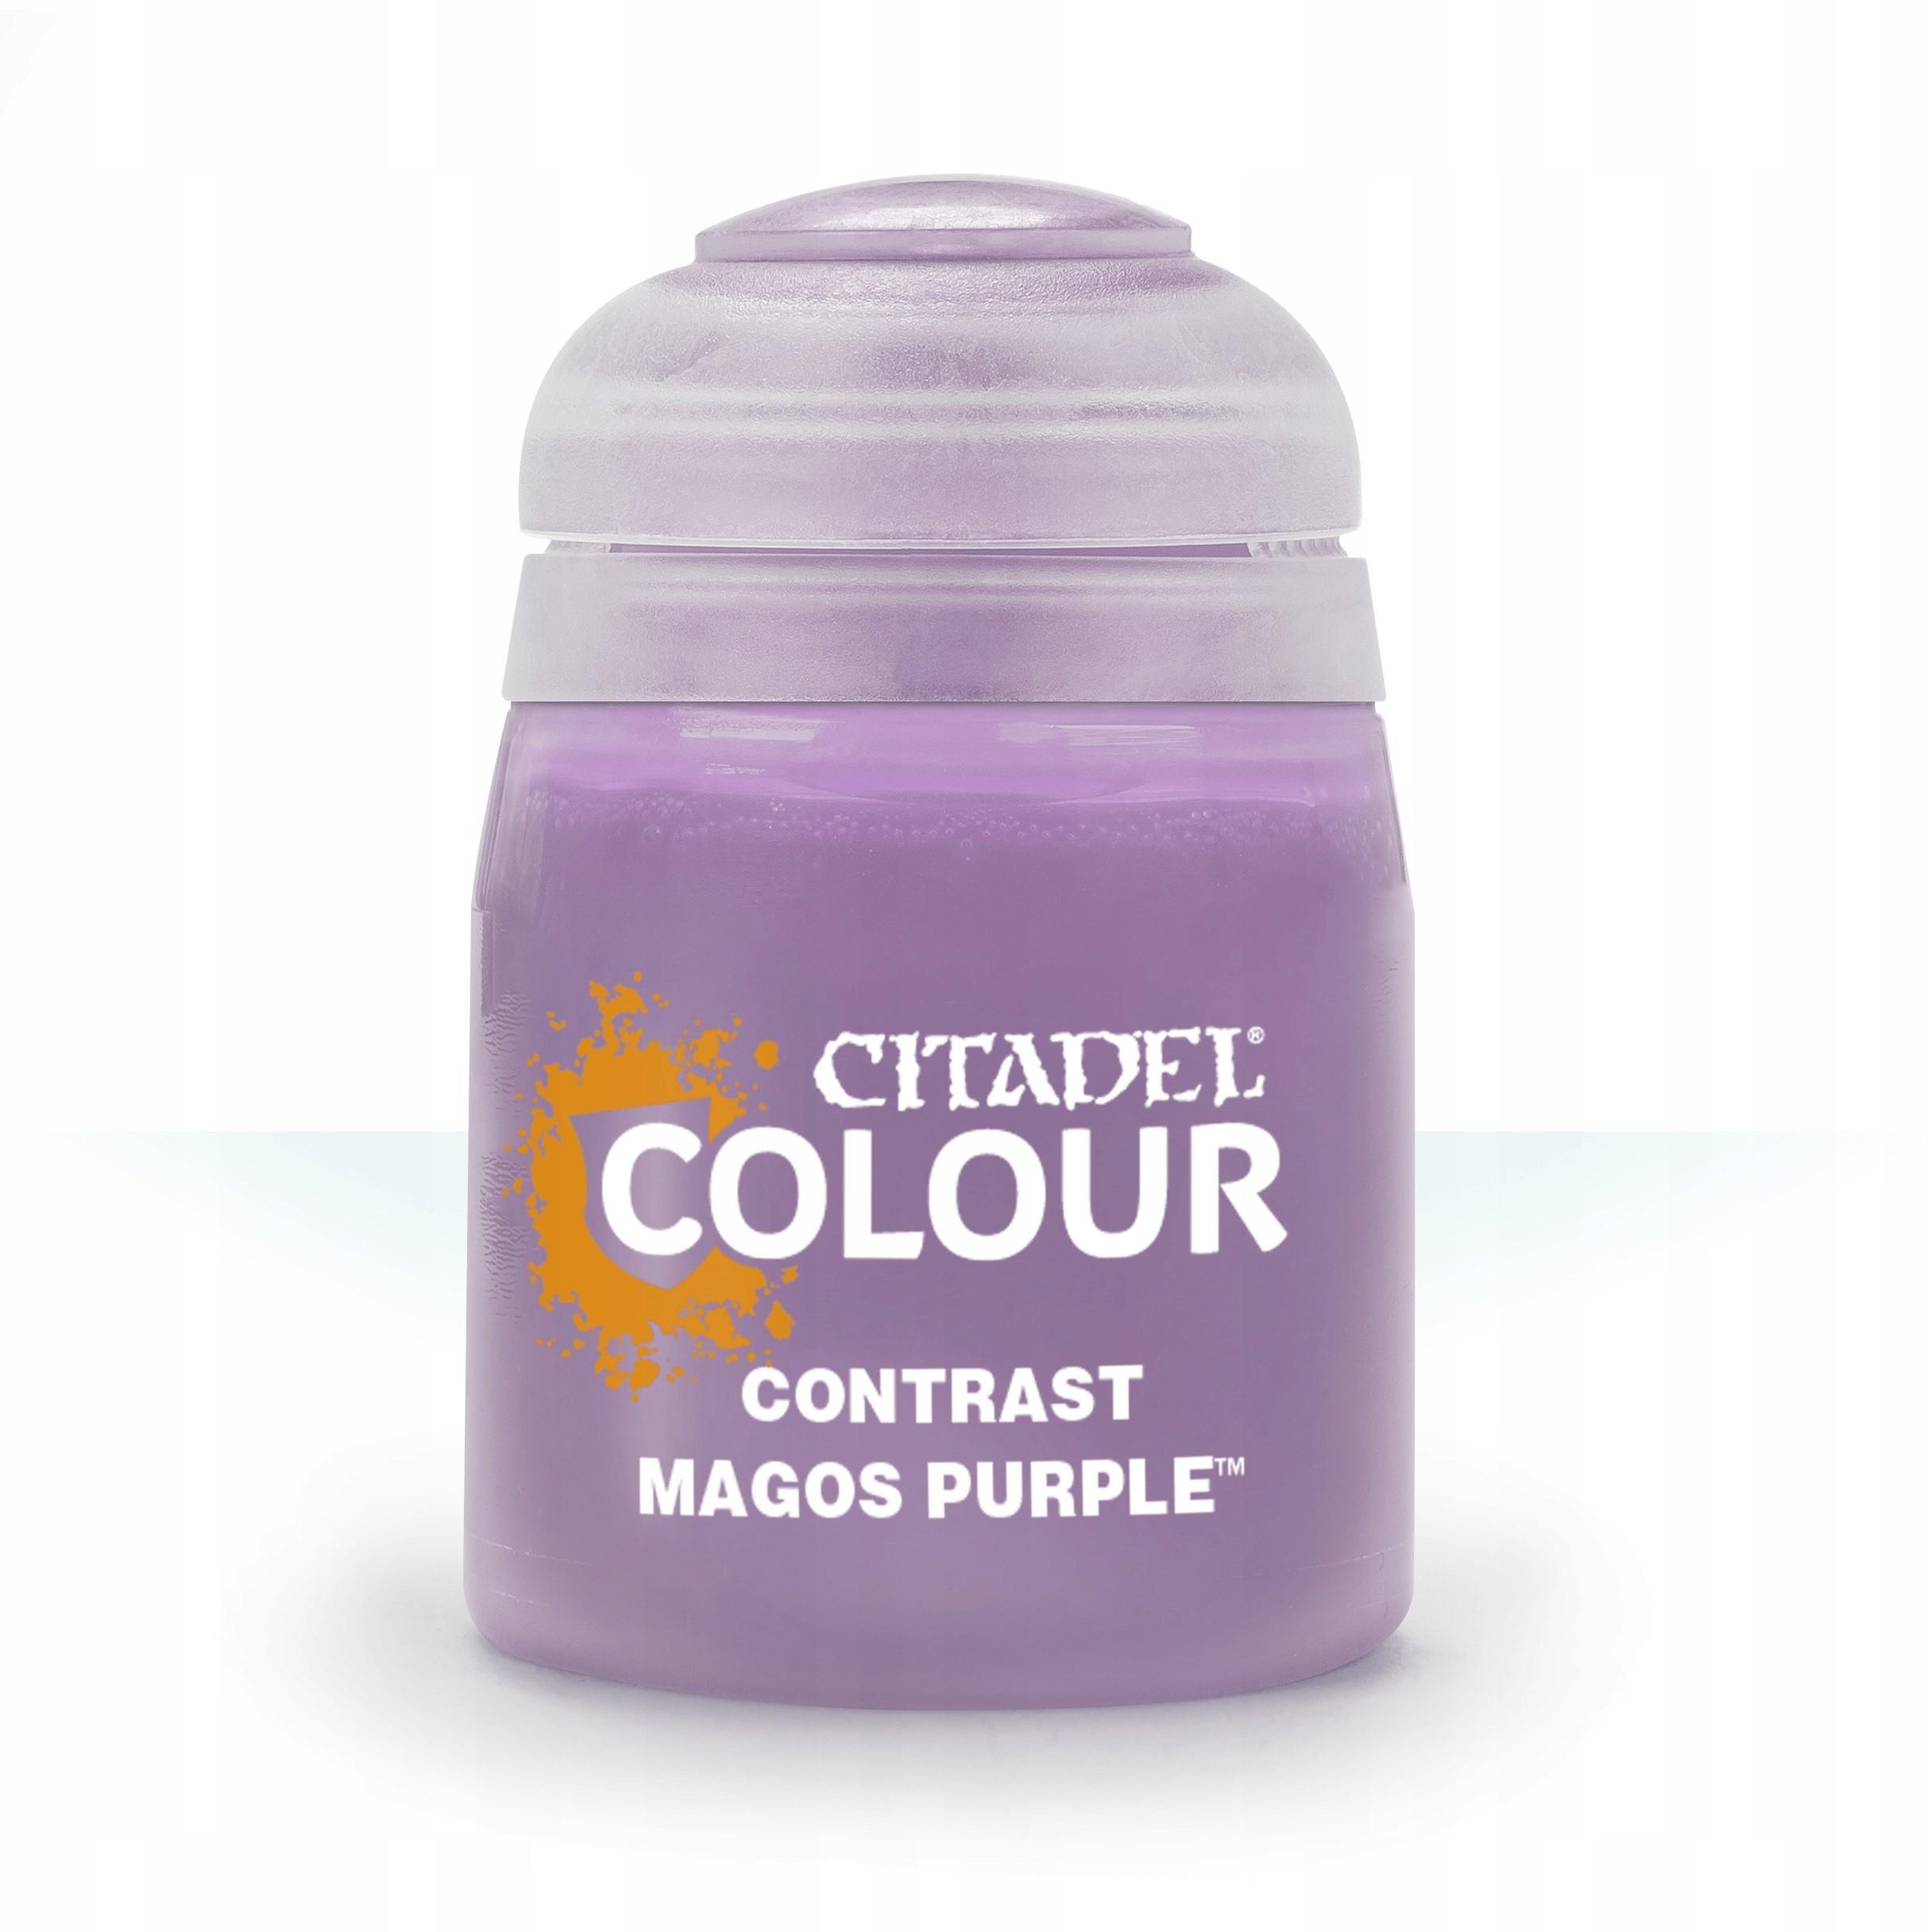 Citadel Colour Contrast Magos Purple 29-16